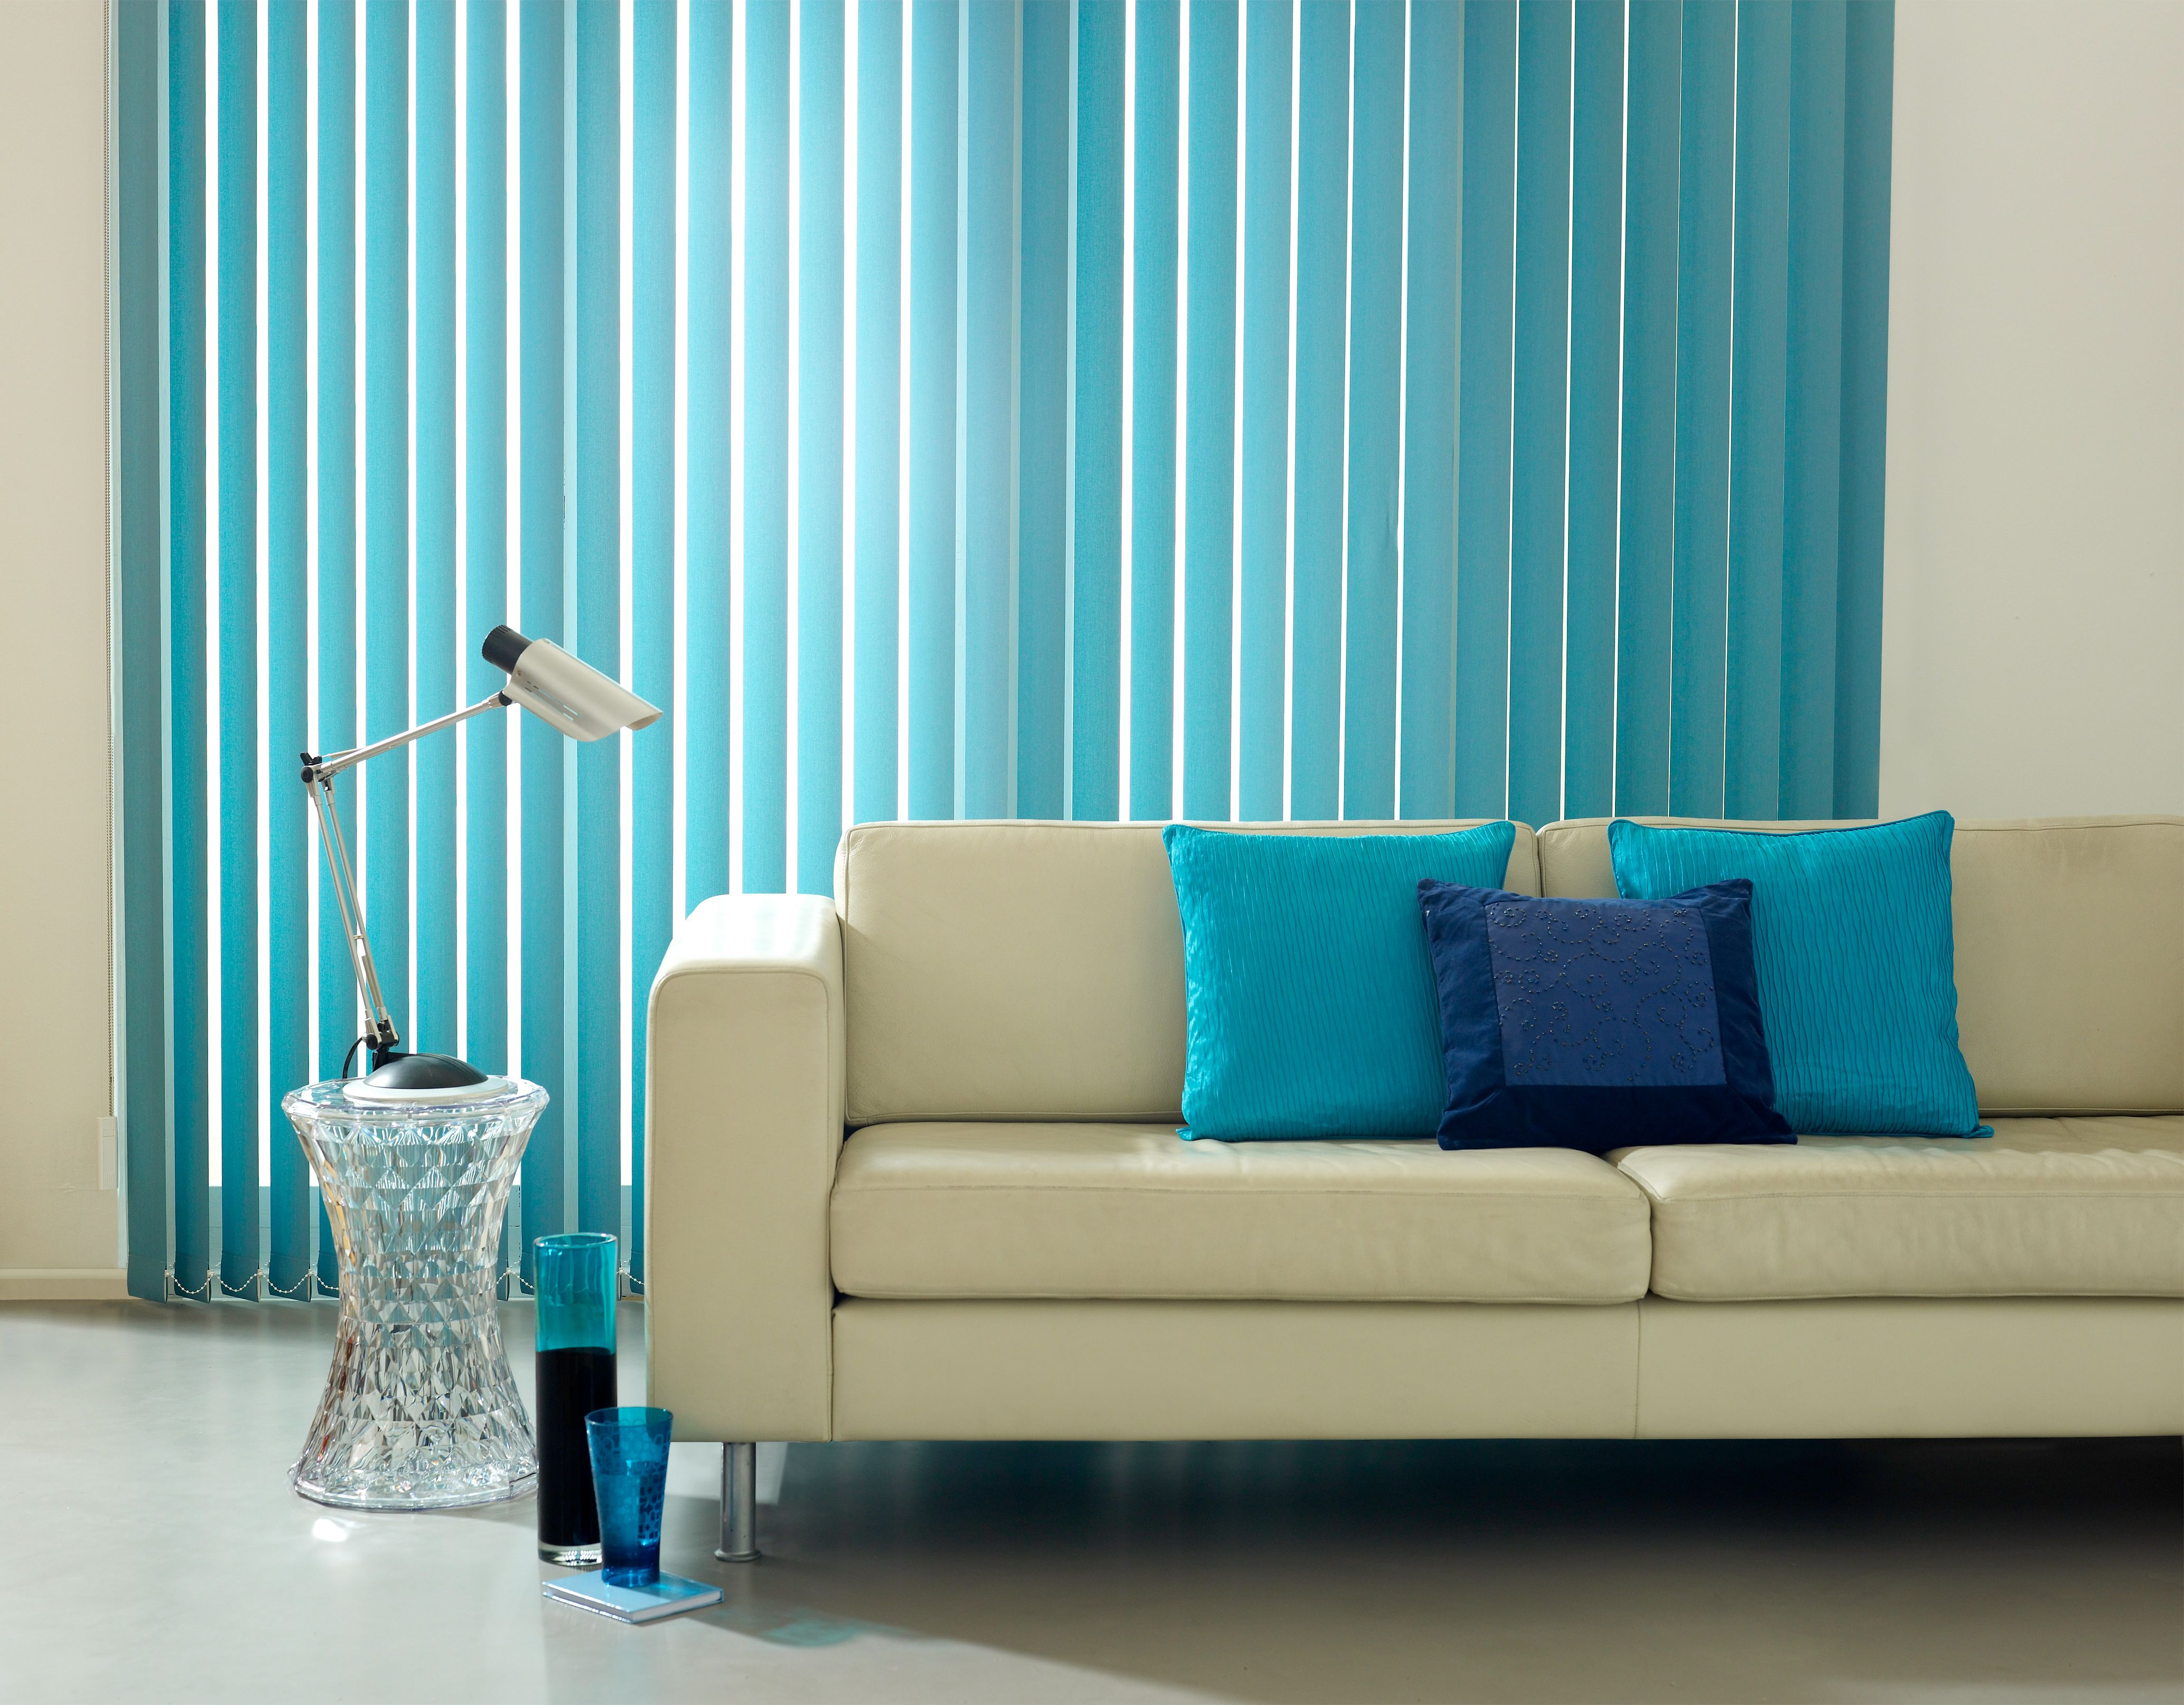 Keeping clean vertical blinds